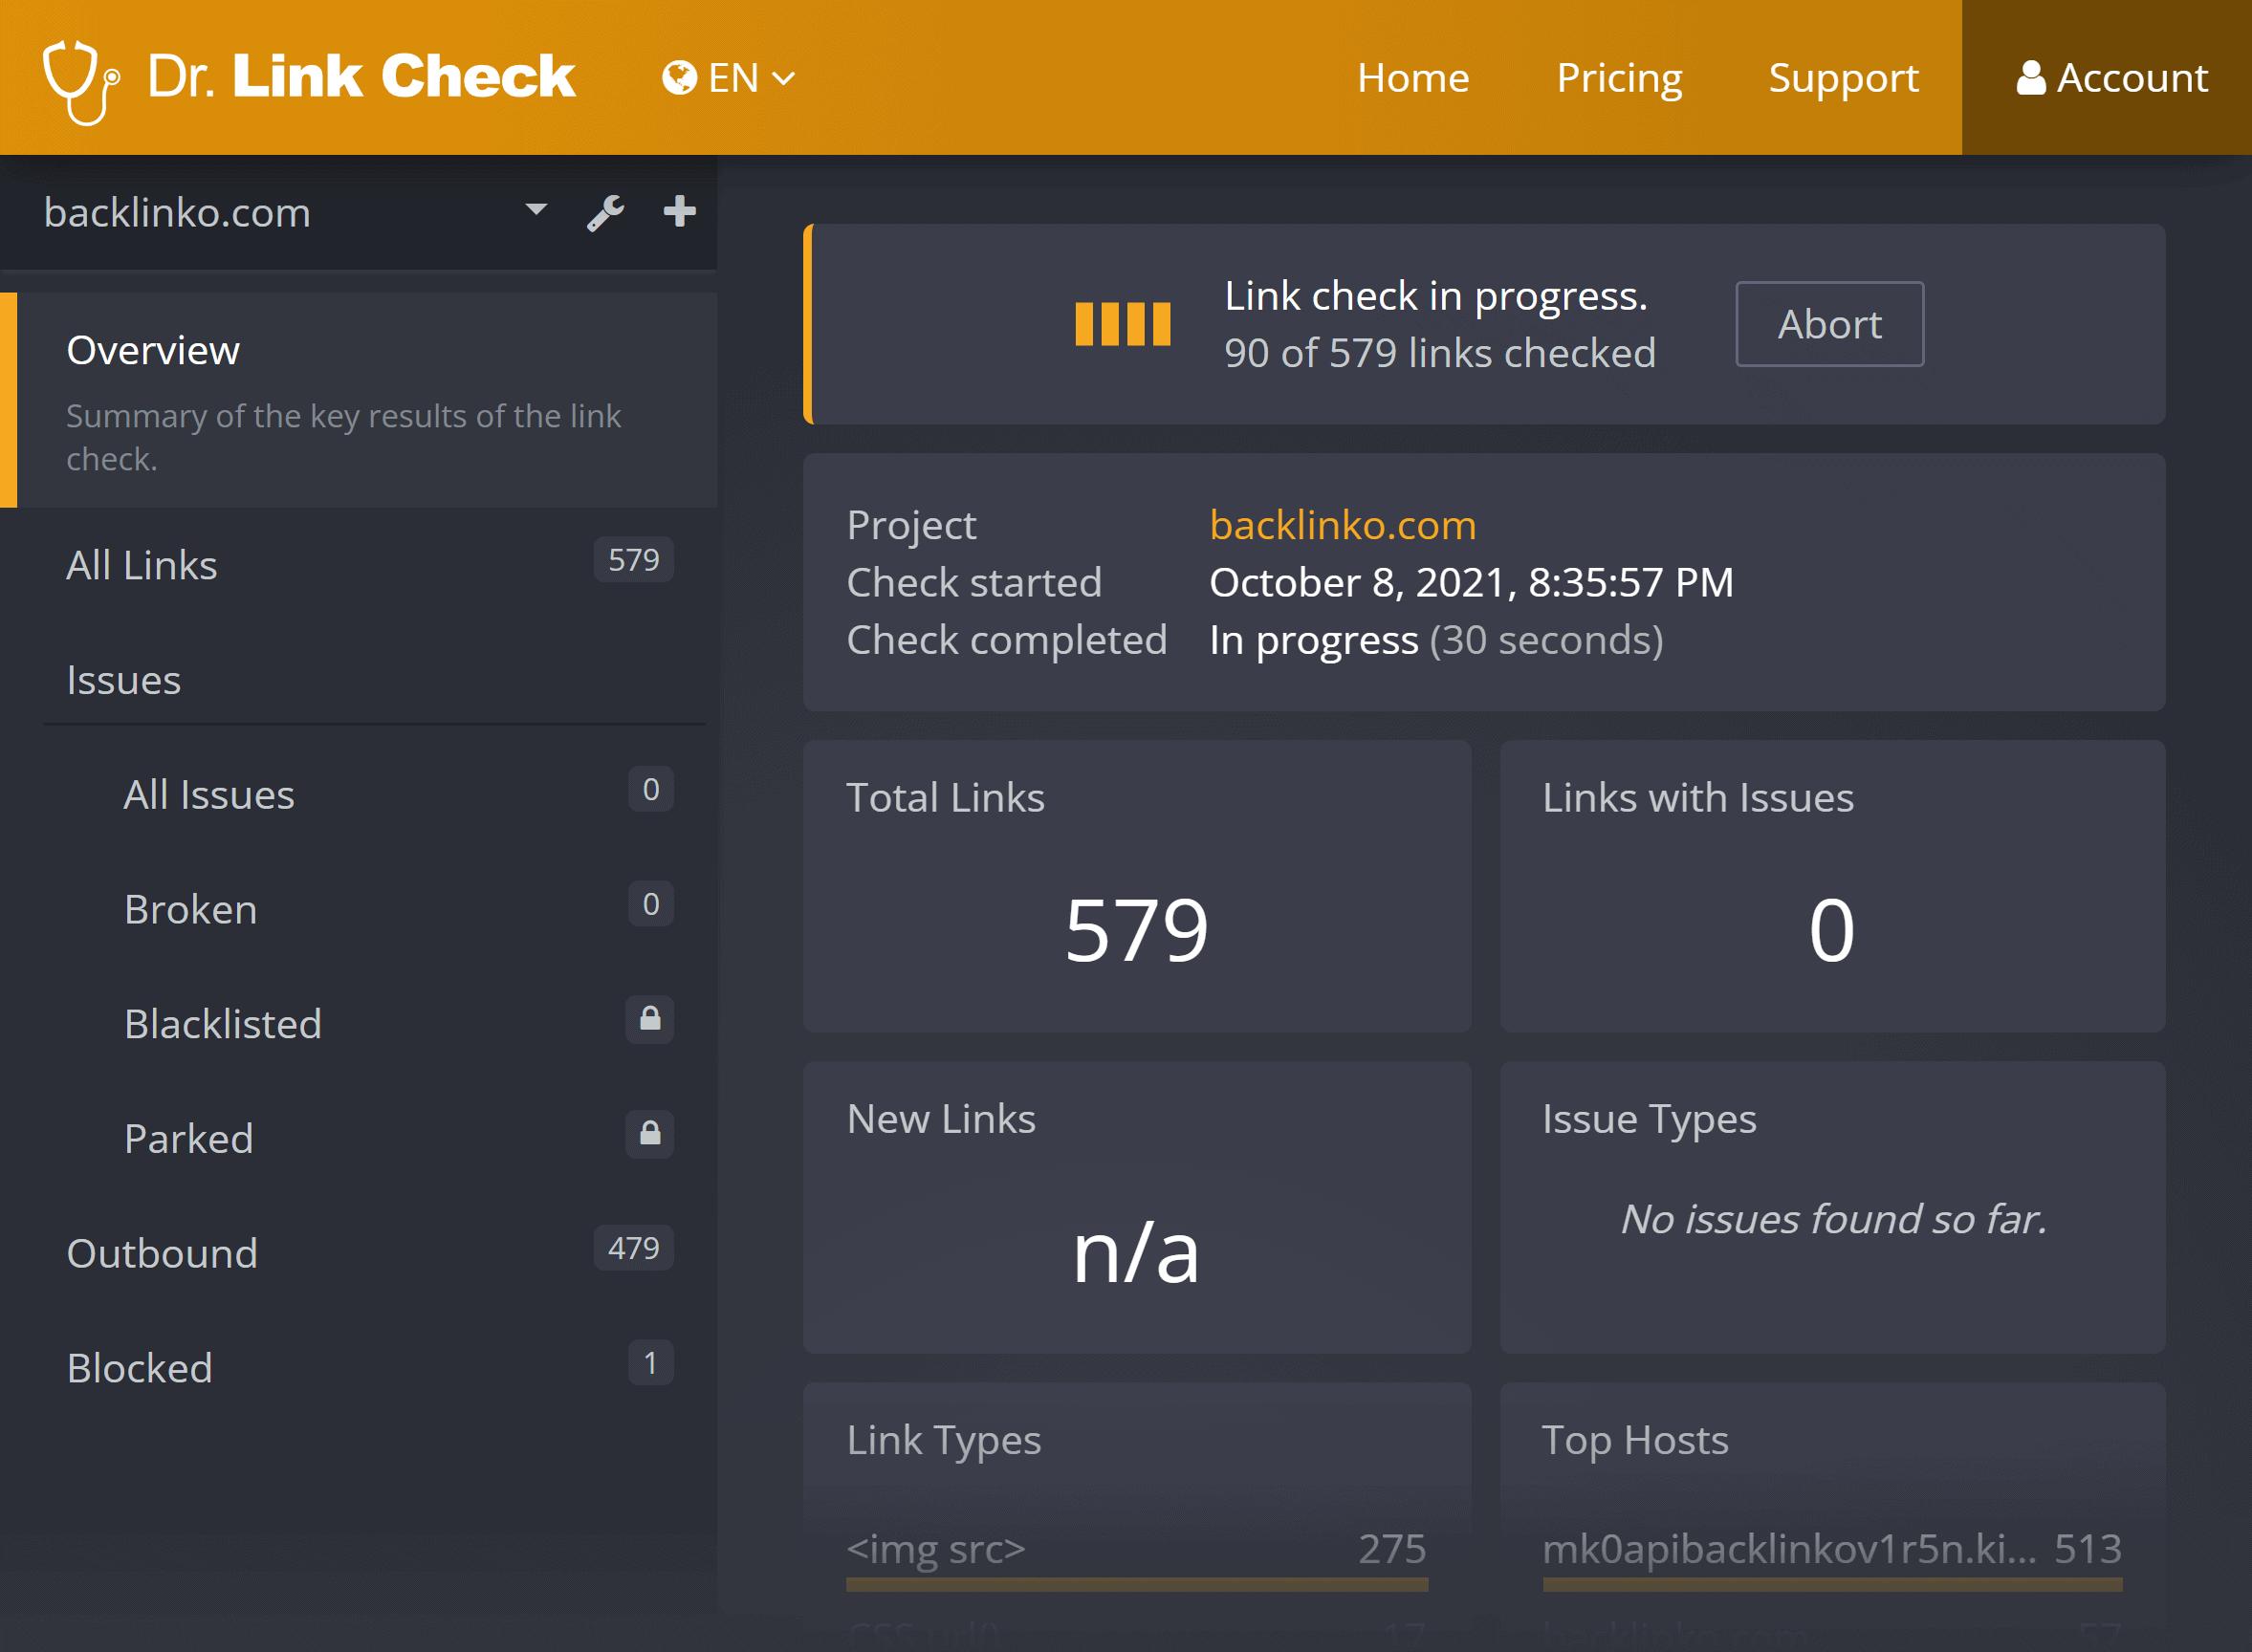 Dr. Link Check – Backlinko